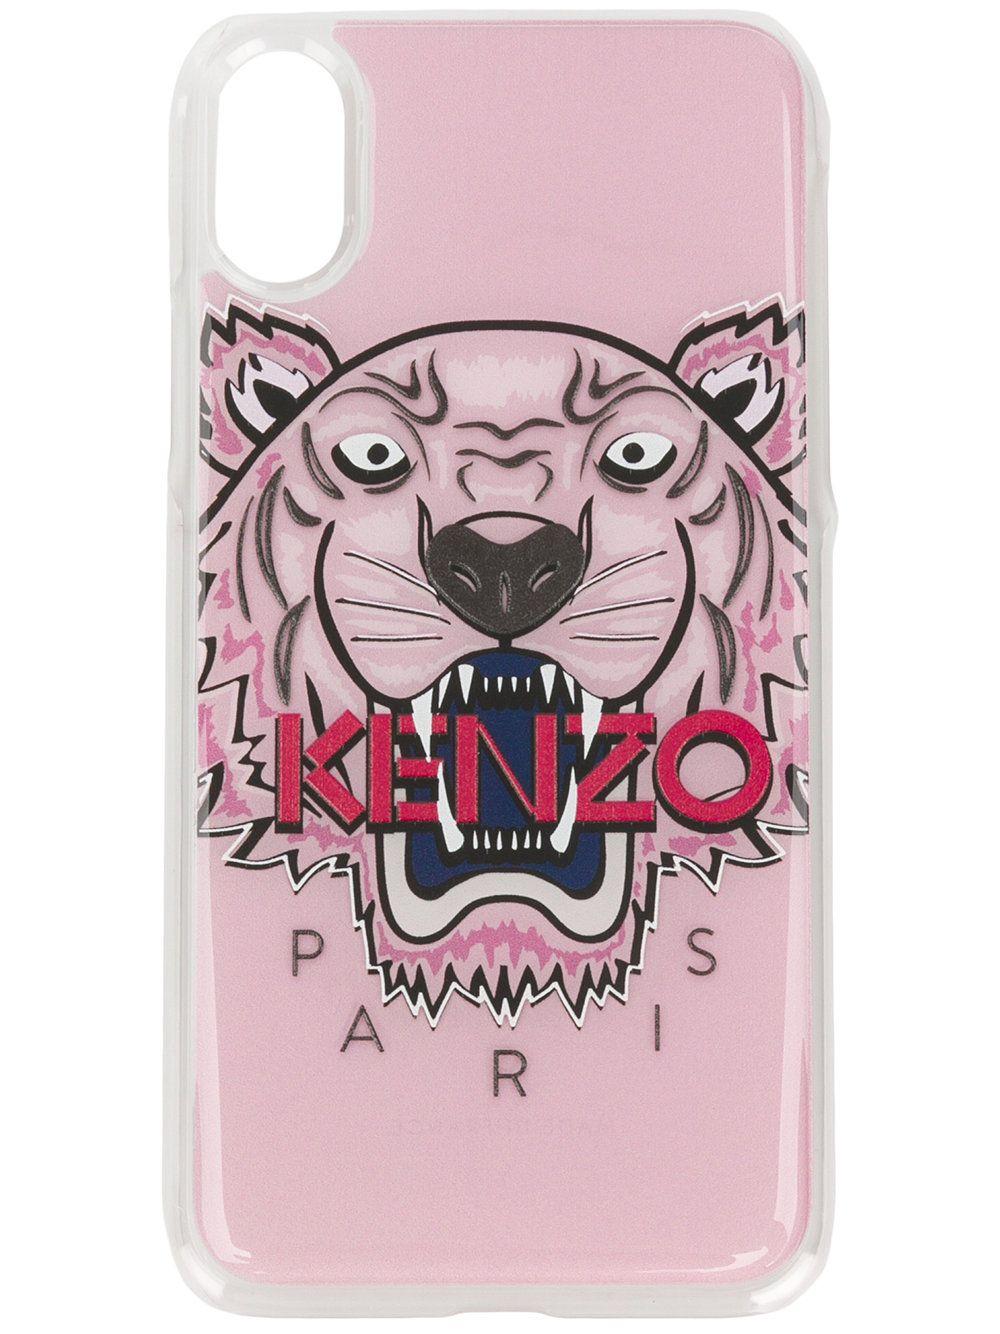 141cb32109 Kenzo Tiger iPhone X phone case | Чехлы | Чехлы